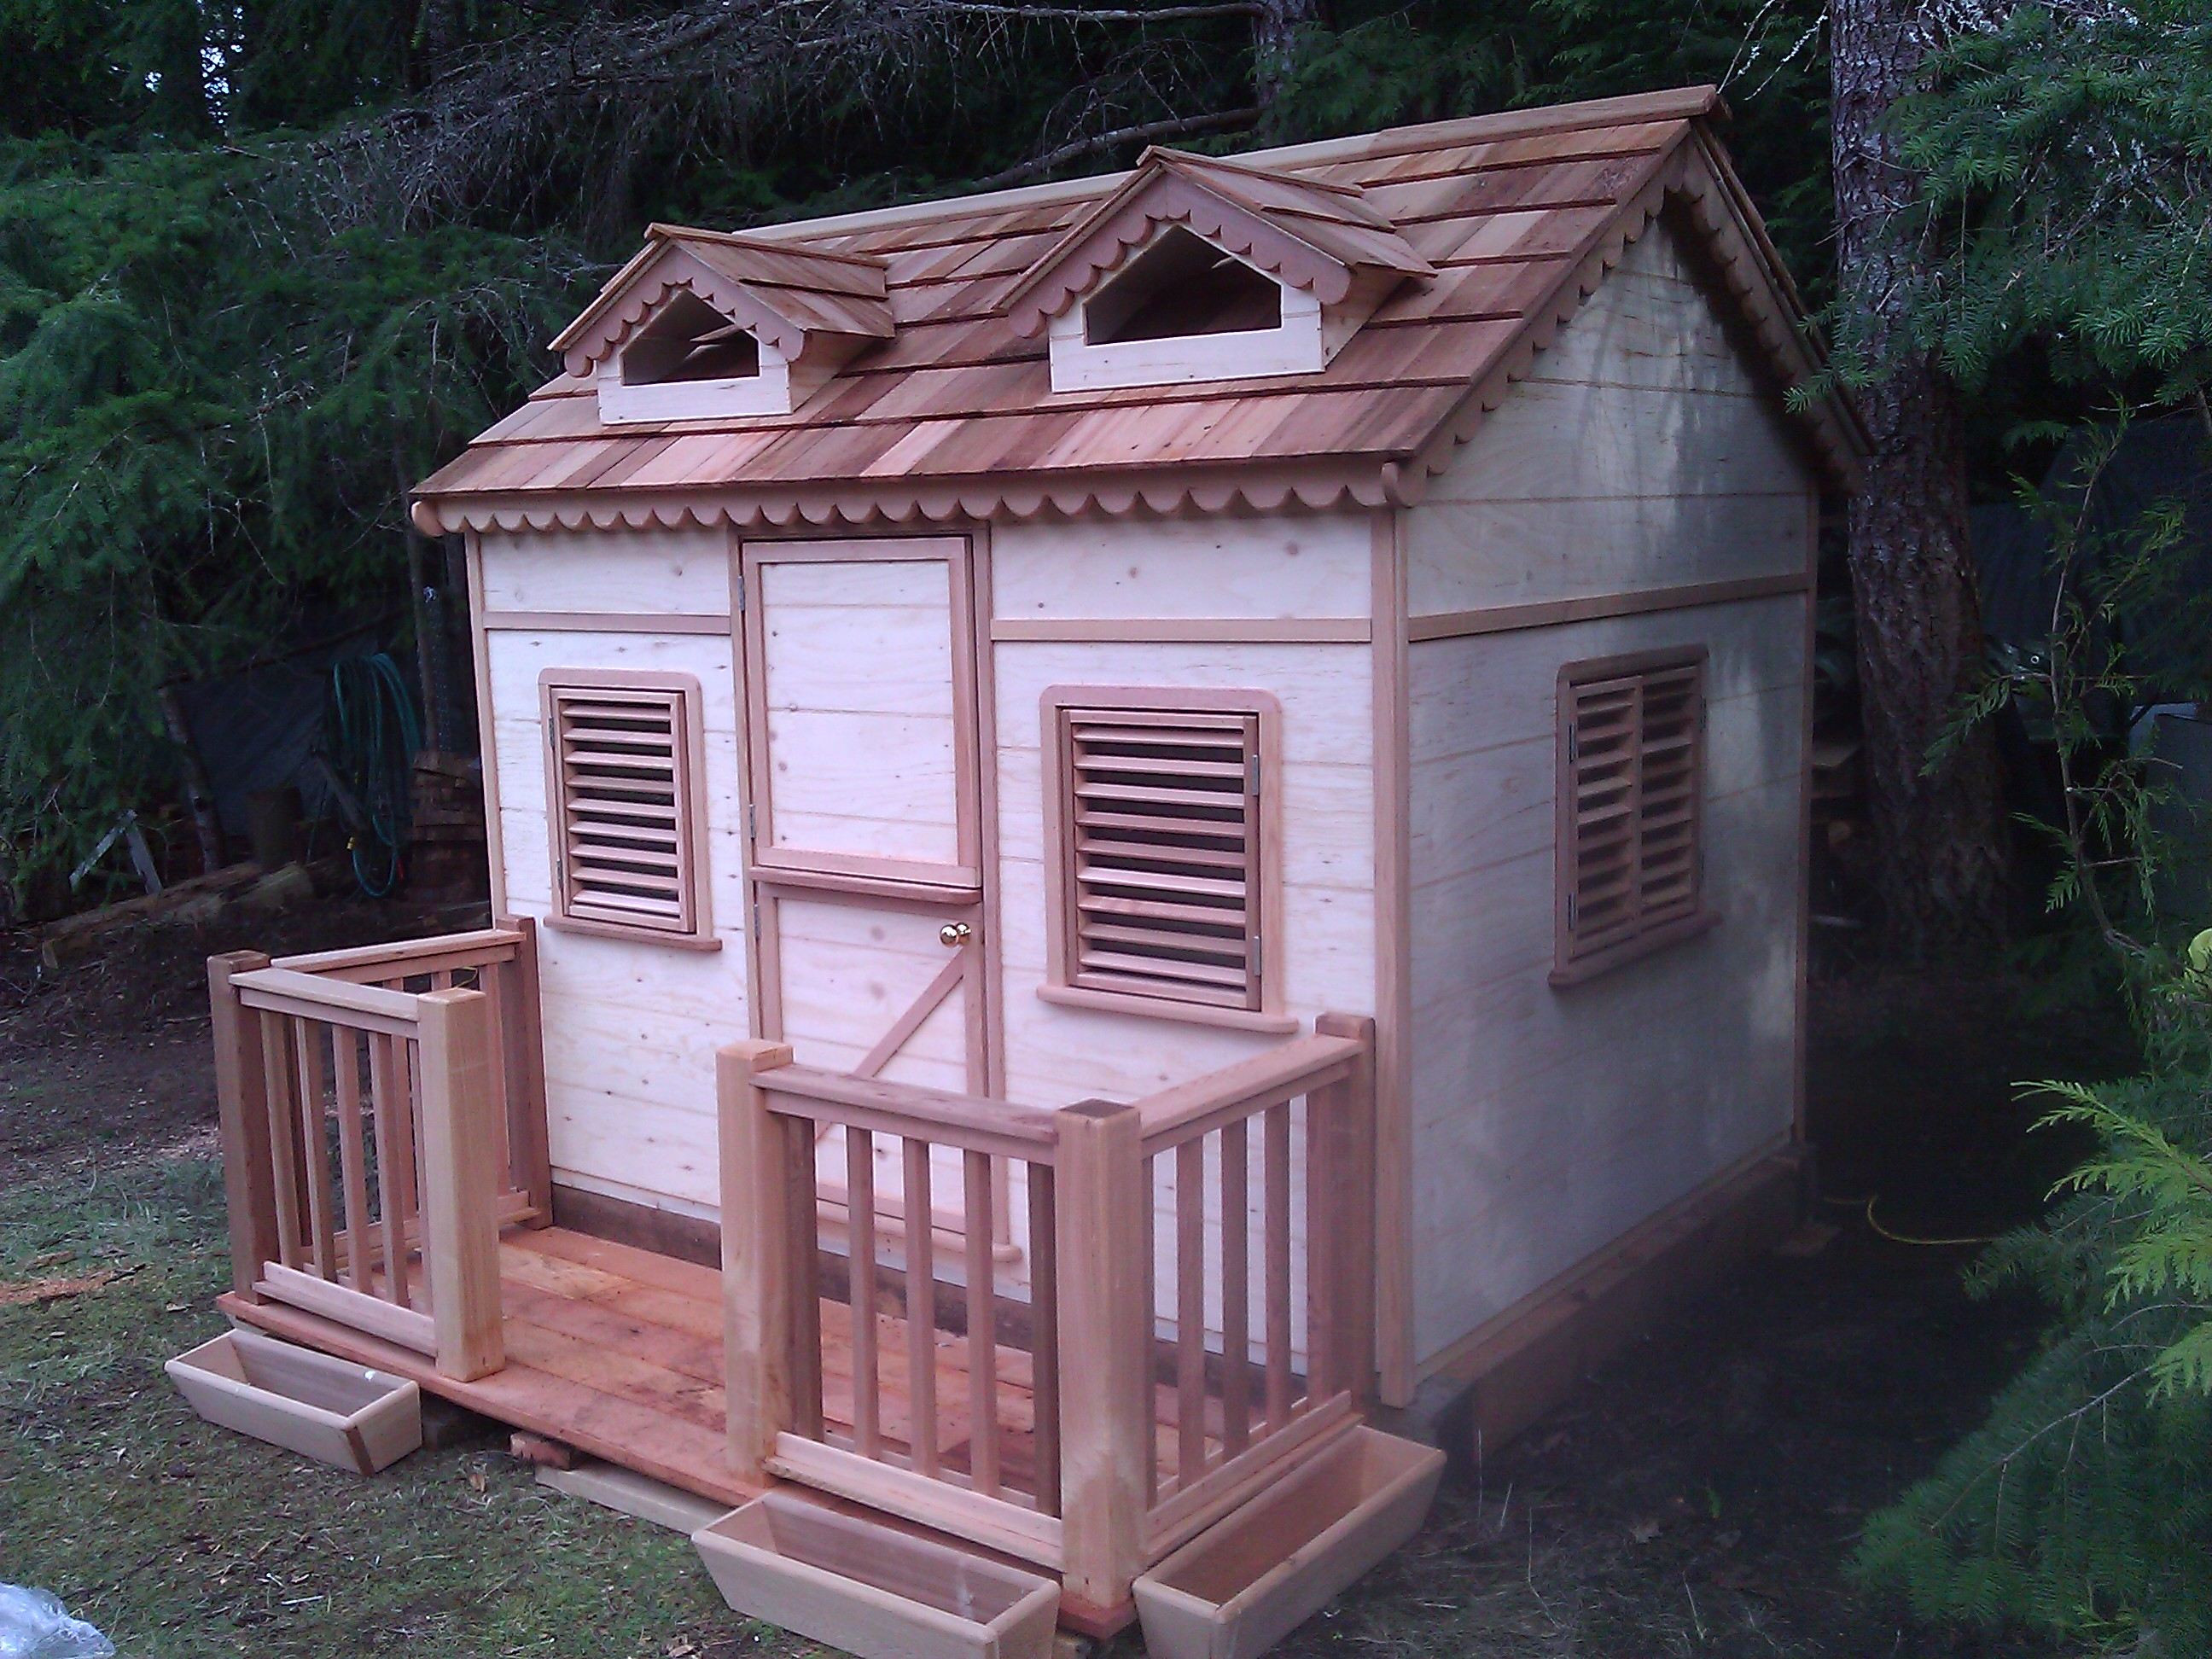 Cedar play houses wooden children playhouses build a for Childrens wooden playhouse kits